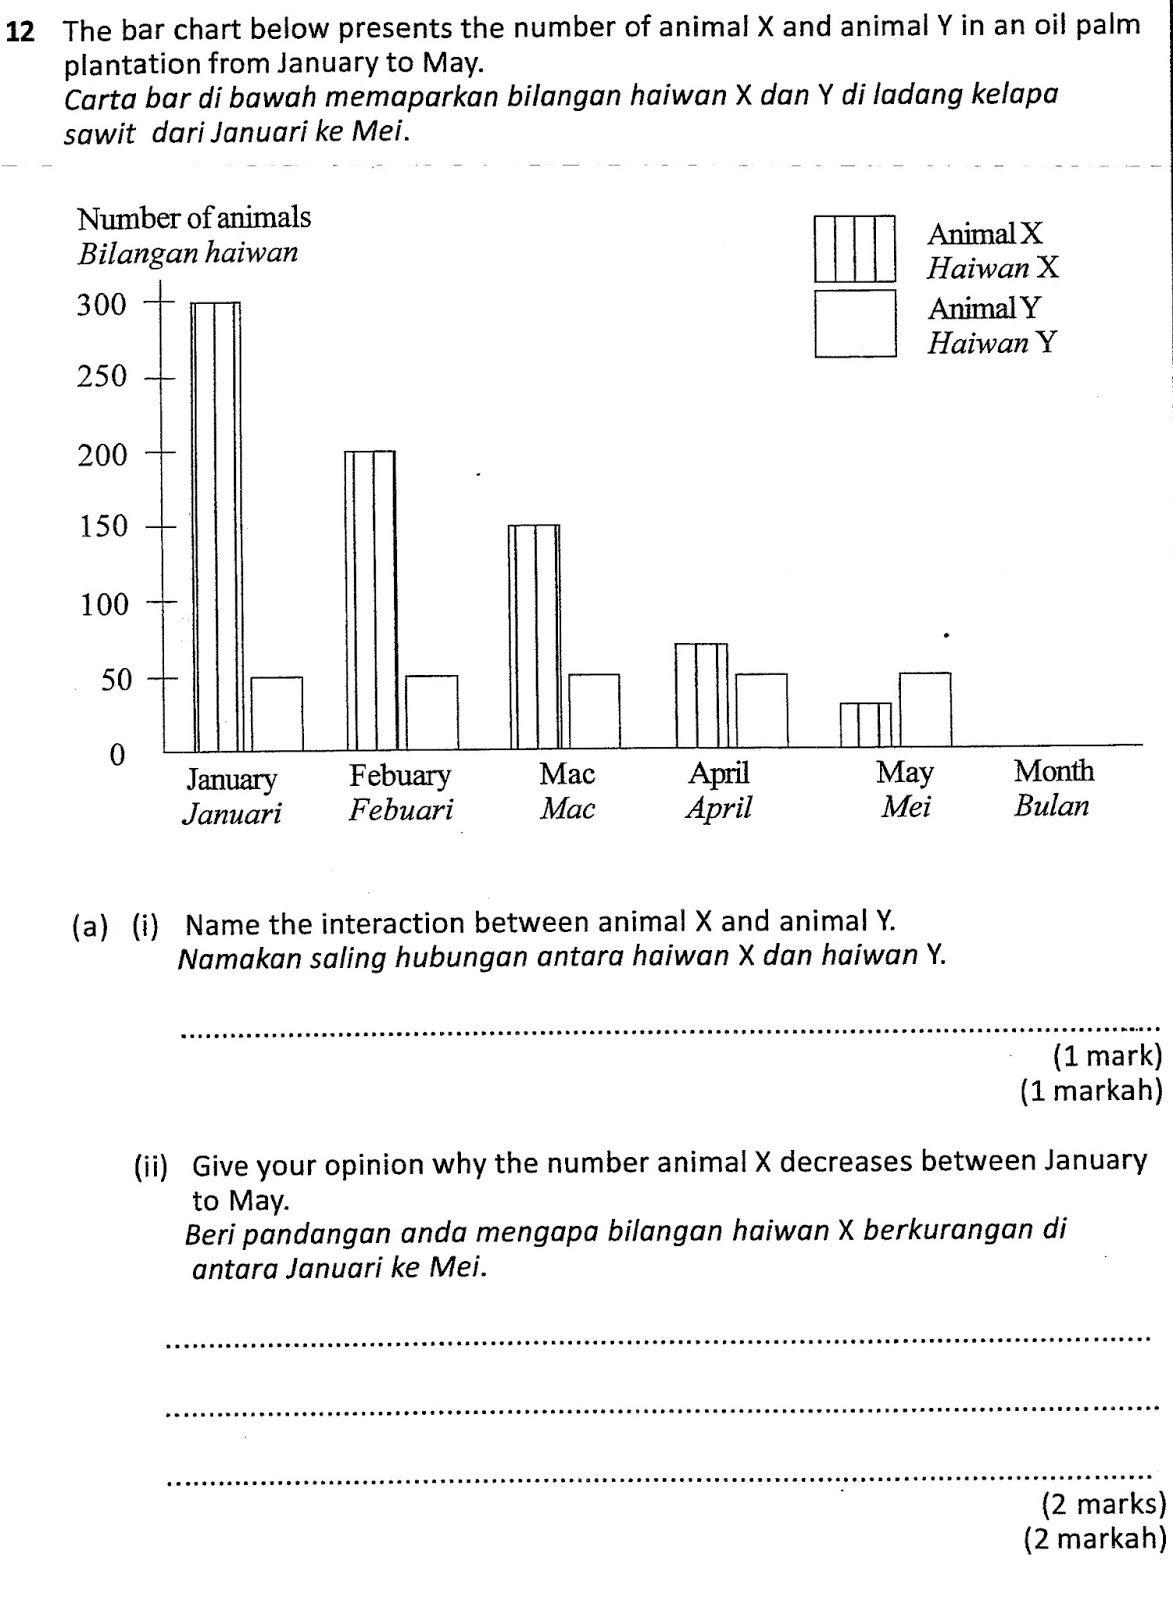 Kbsoalan3 Jpg 1173 1600 Math Education Chart